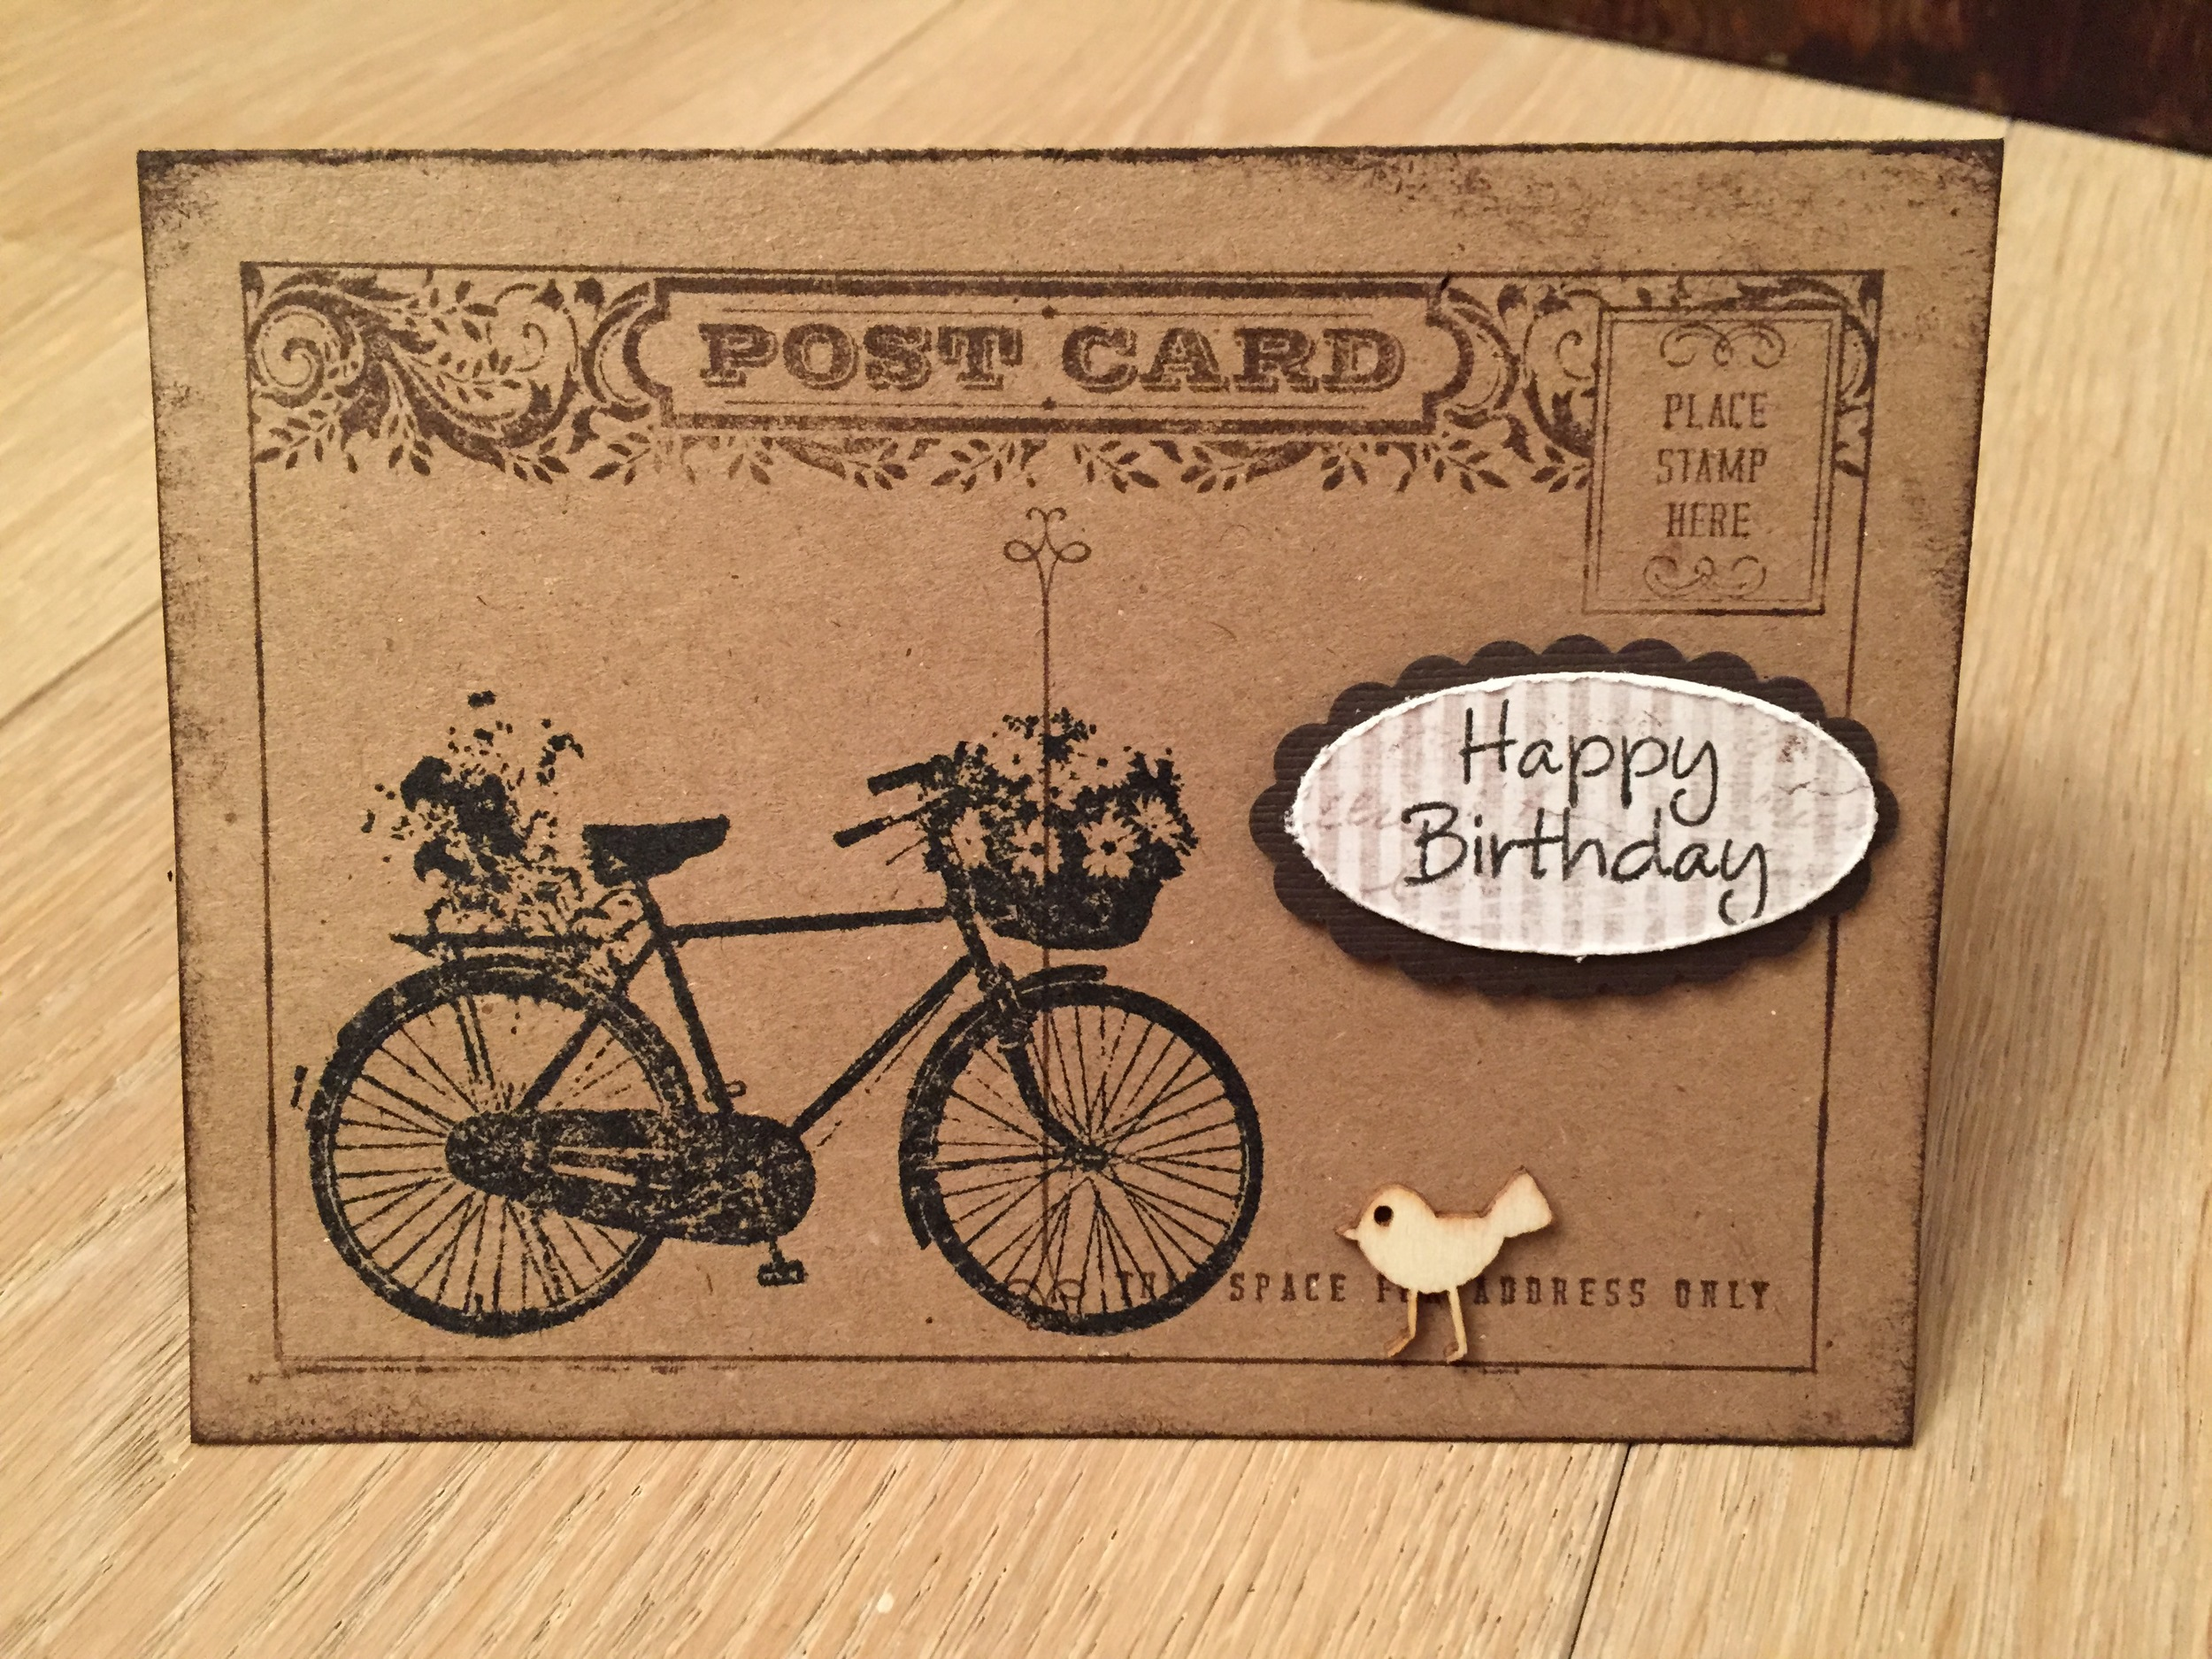 Postcard Happy Birthday.JPG